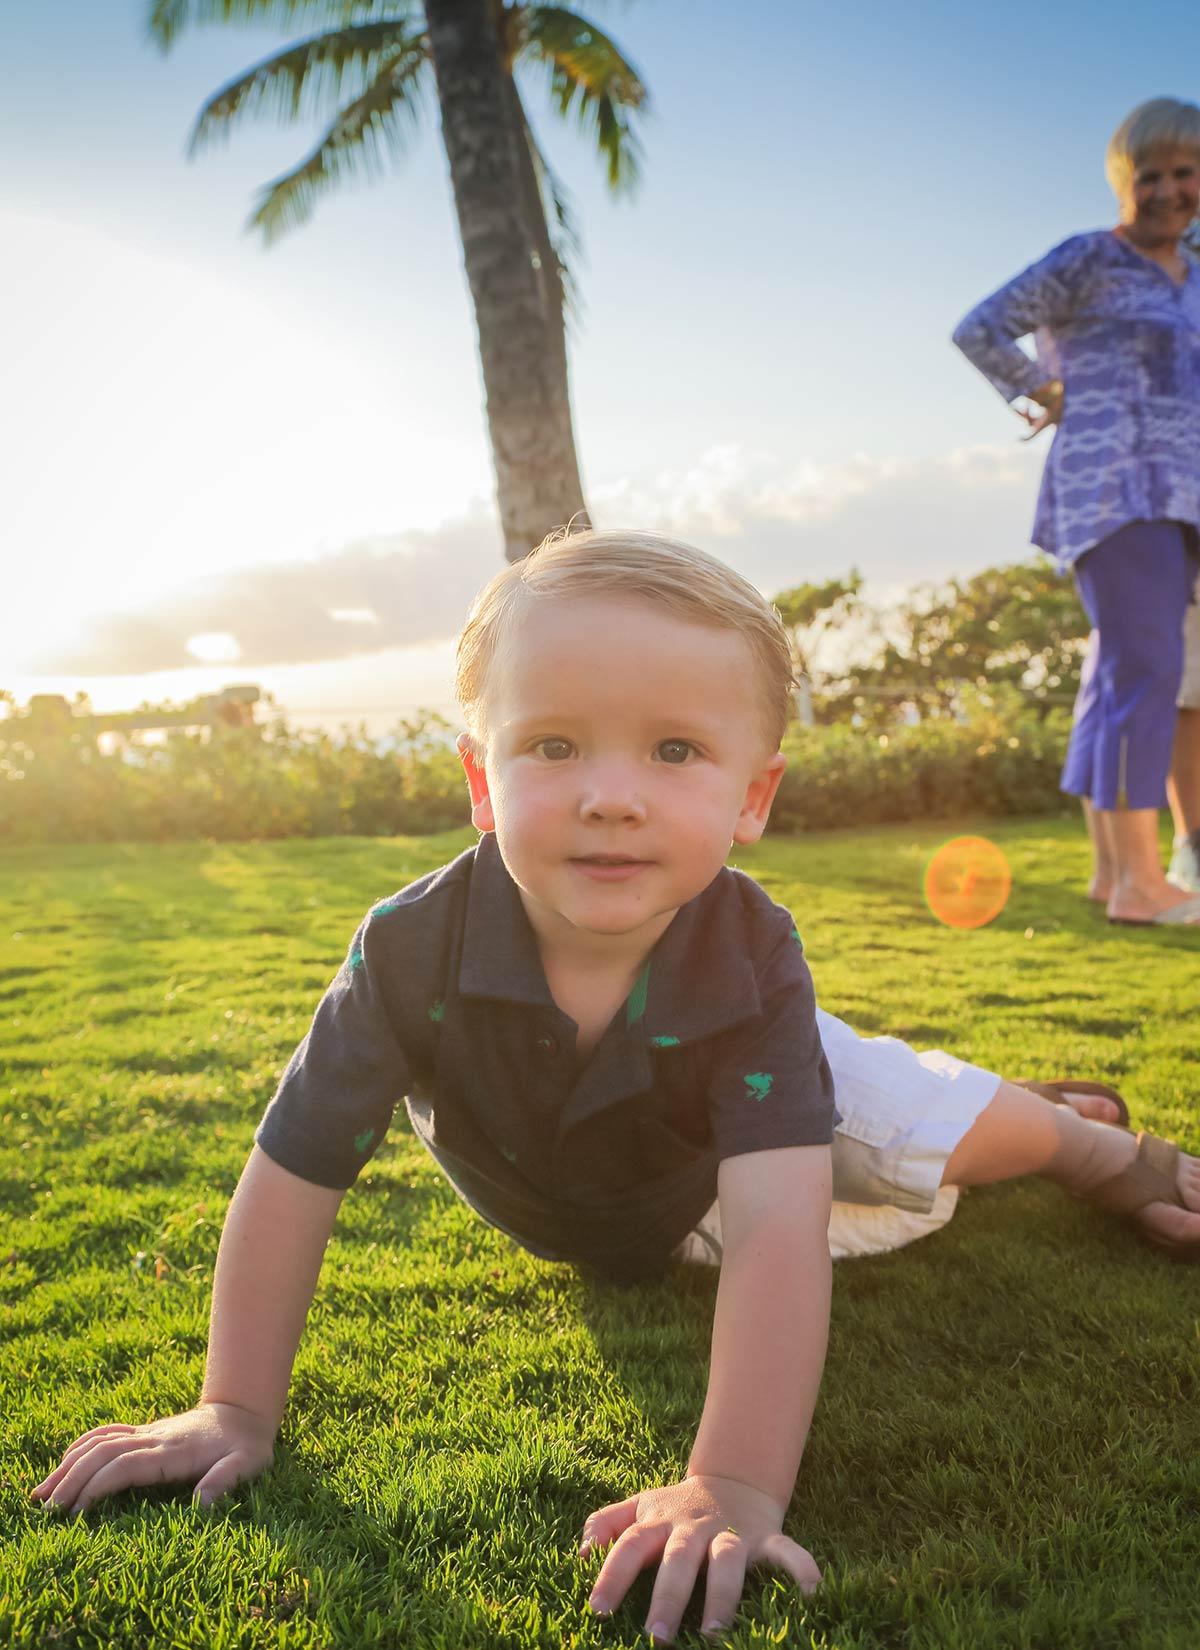 child-photography-session-Maui-stricklen.jpg